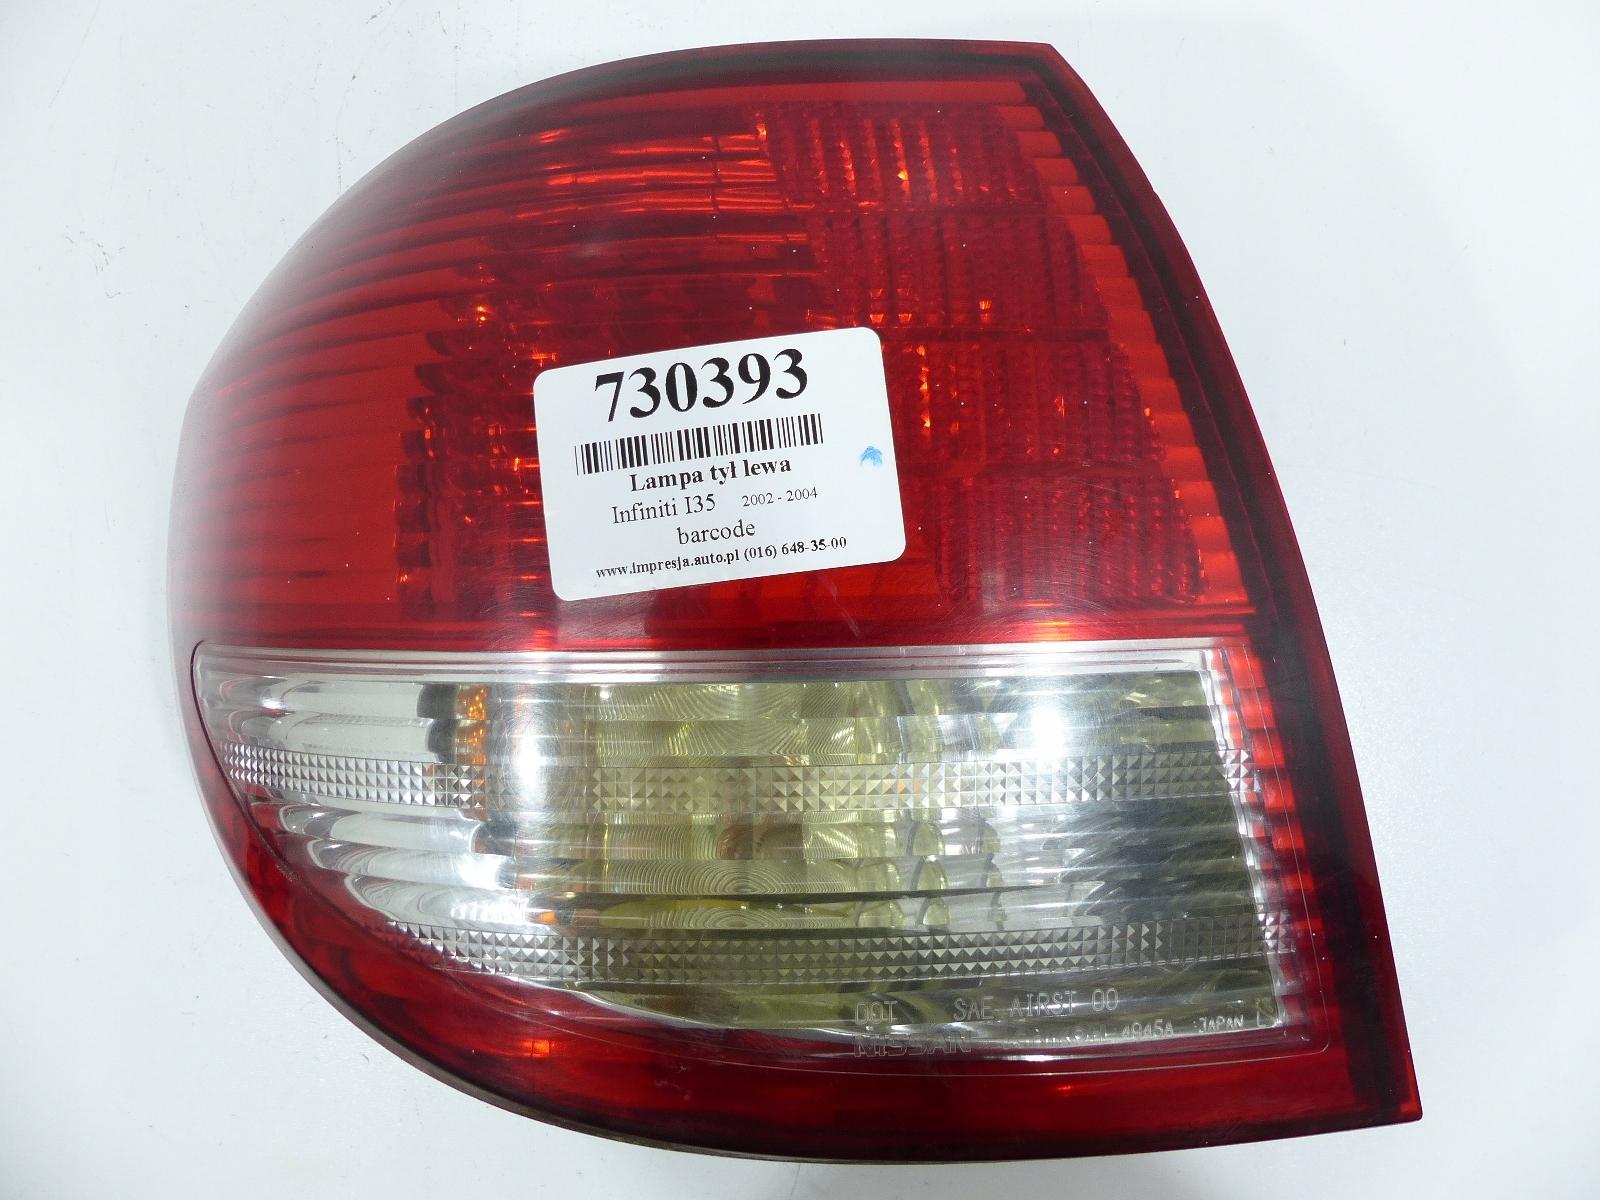 infiniti i35 02-04 лампа сзади слева